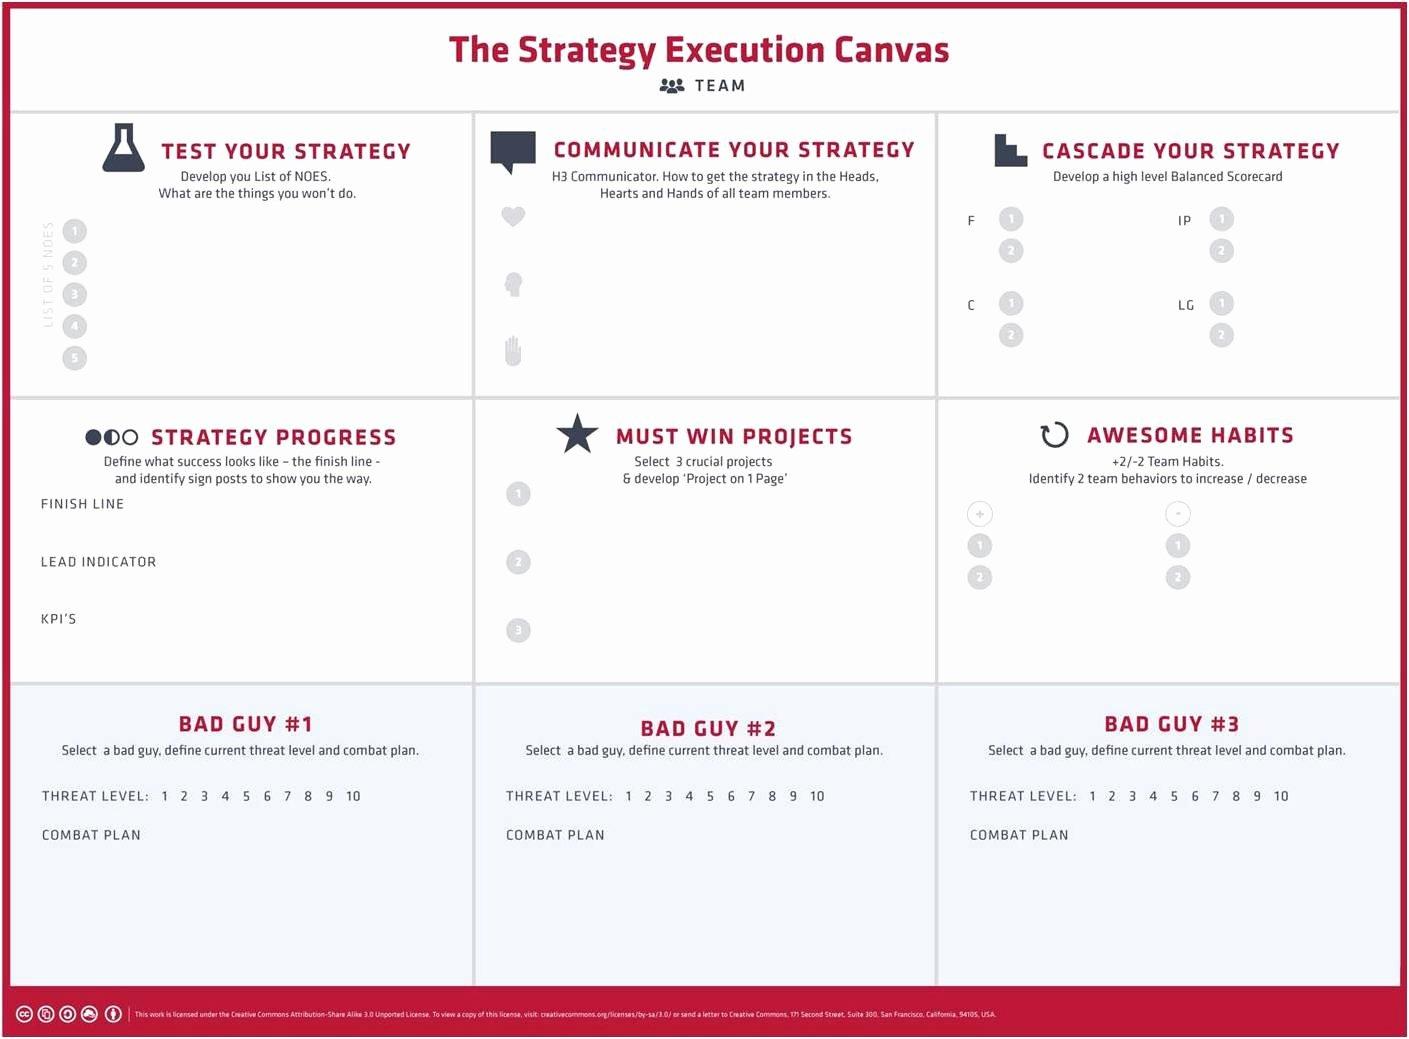 Simple Implementation Plan Template Elegant Implementation Plan Template Easy to Use Steps & Example